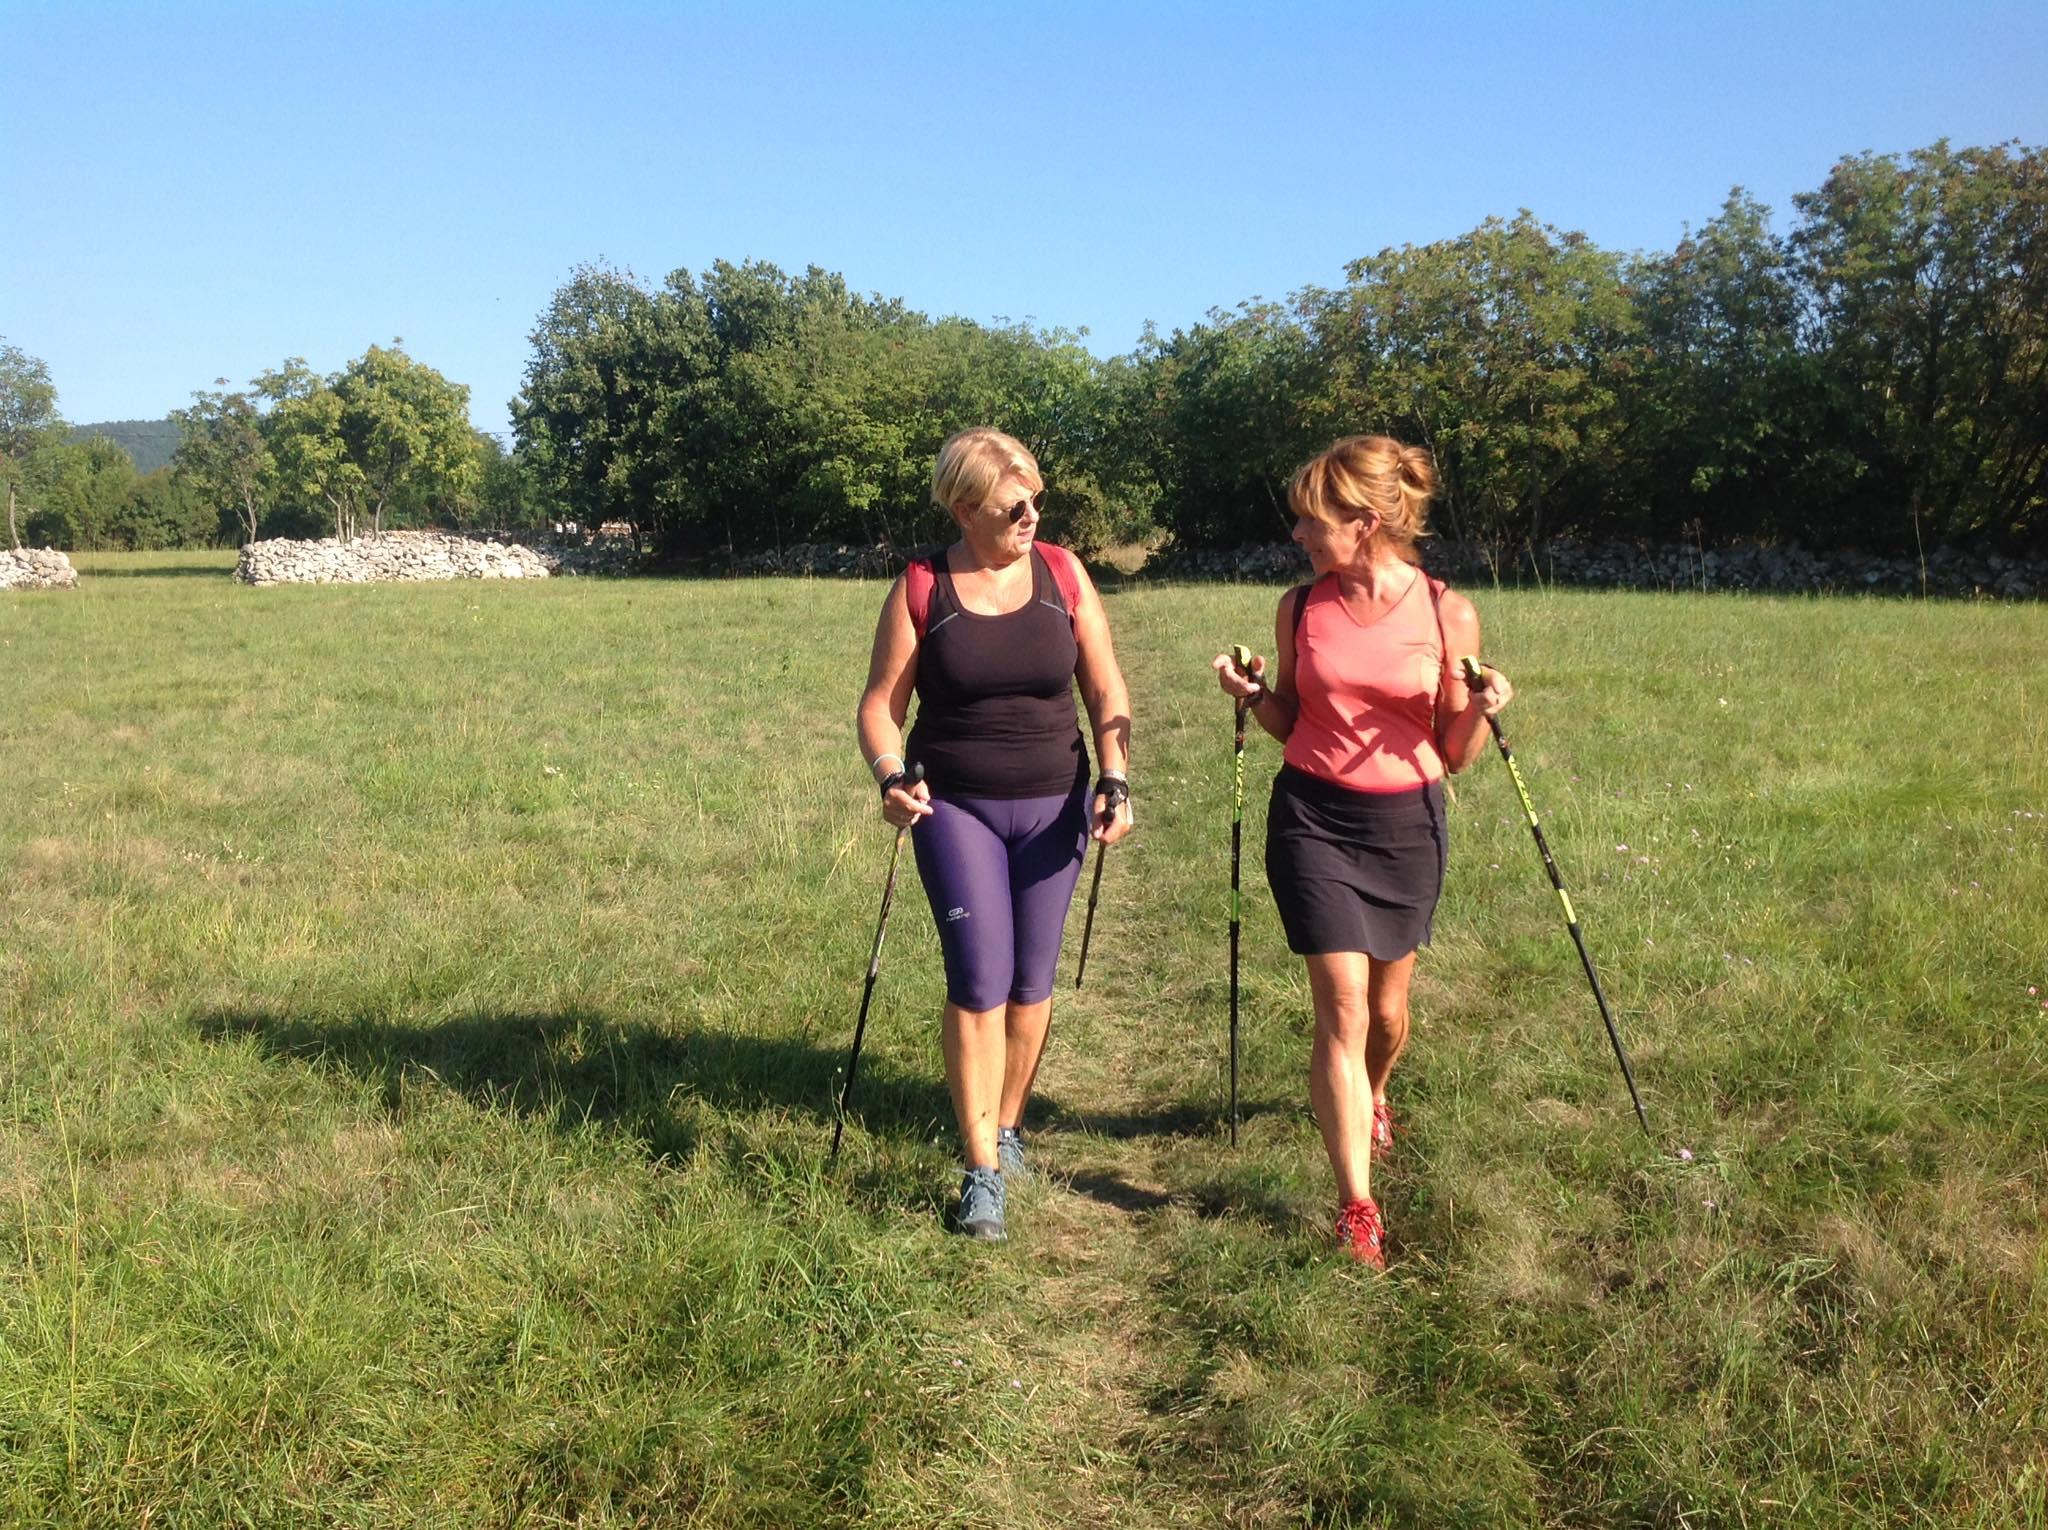 2020-09-02 Nordic Walking - Grahovo Brdo - Štorje (S) (6)